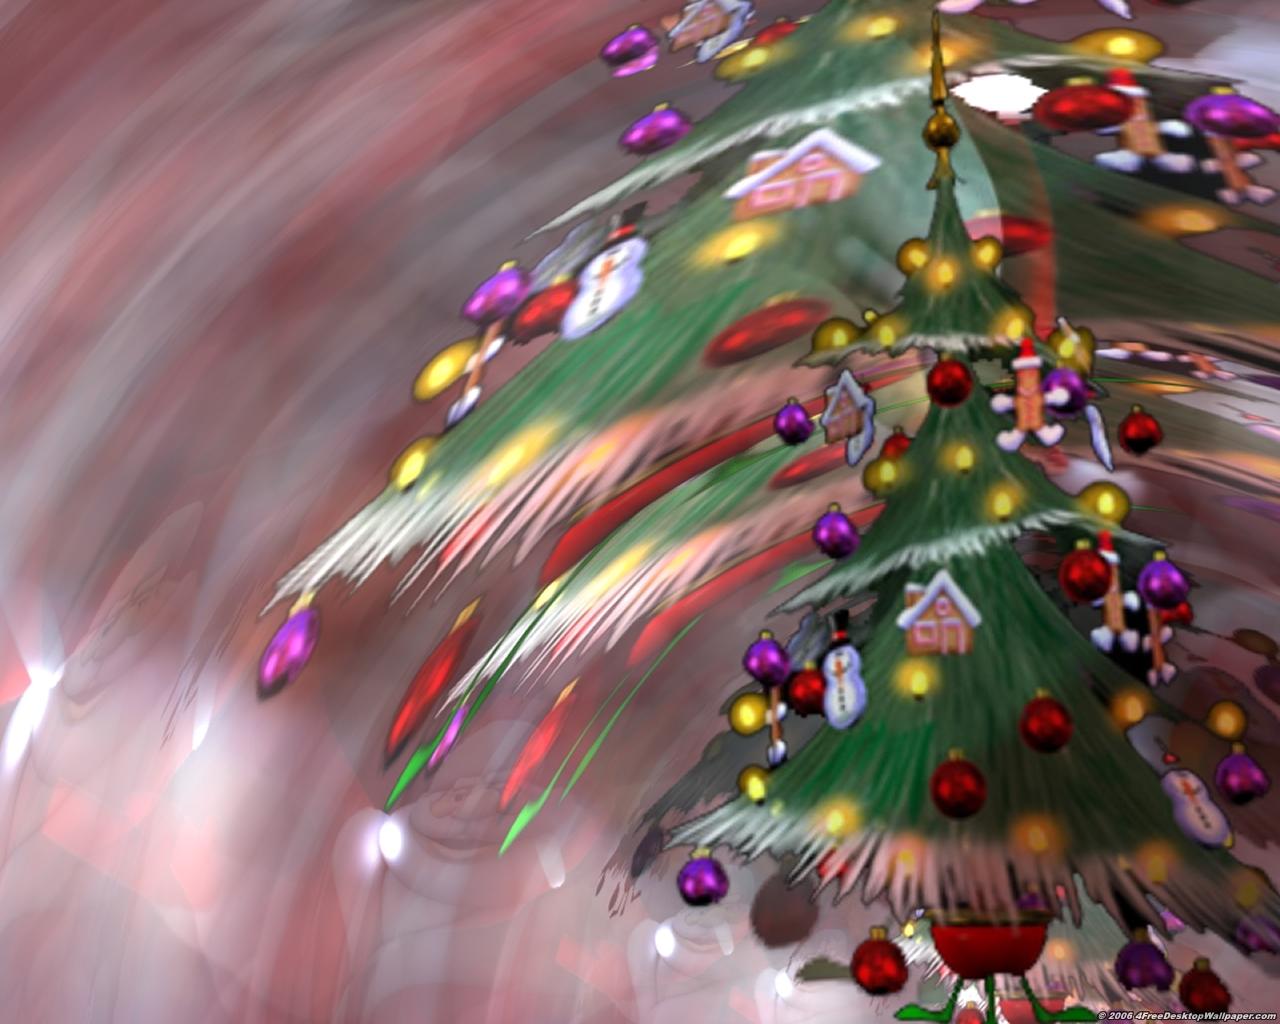 http://2.bp.blogspot.com/-lkYDcJOFnLk/TkOfBz9FFxI/AAAAAAAAICo/mkCec38HA2Q/s1600/christmas%2Bwallpaper%2Bimages-3.jpg